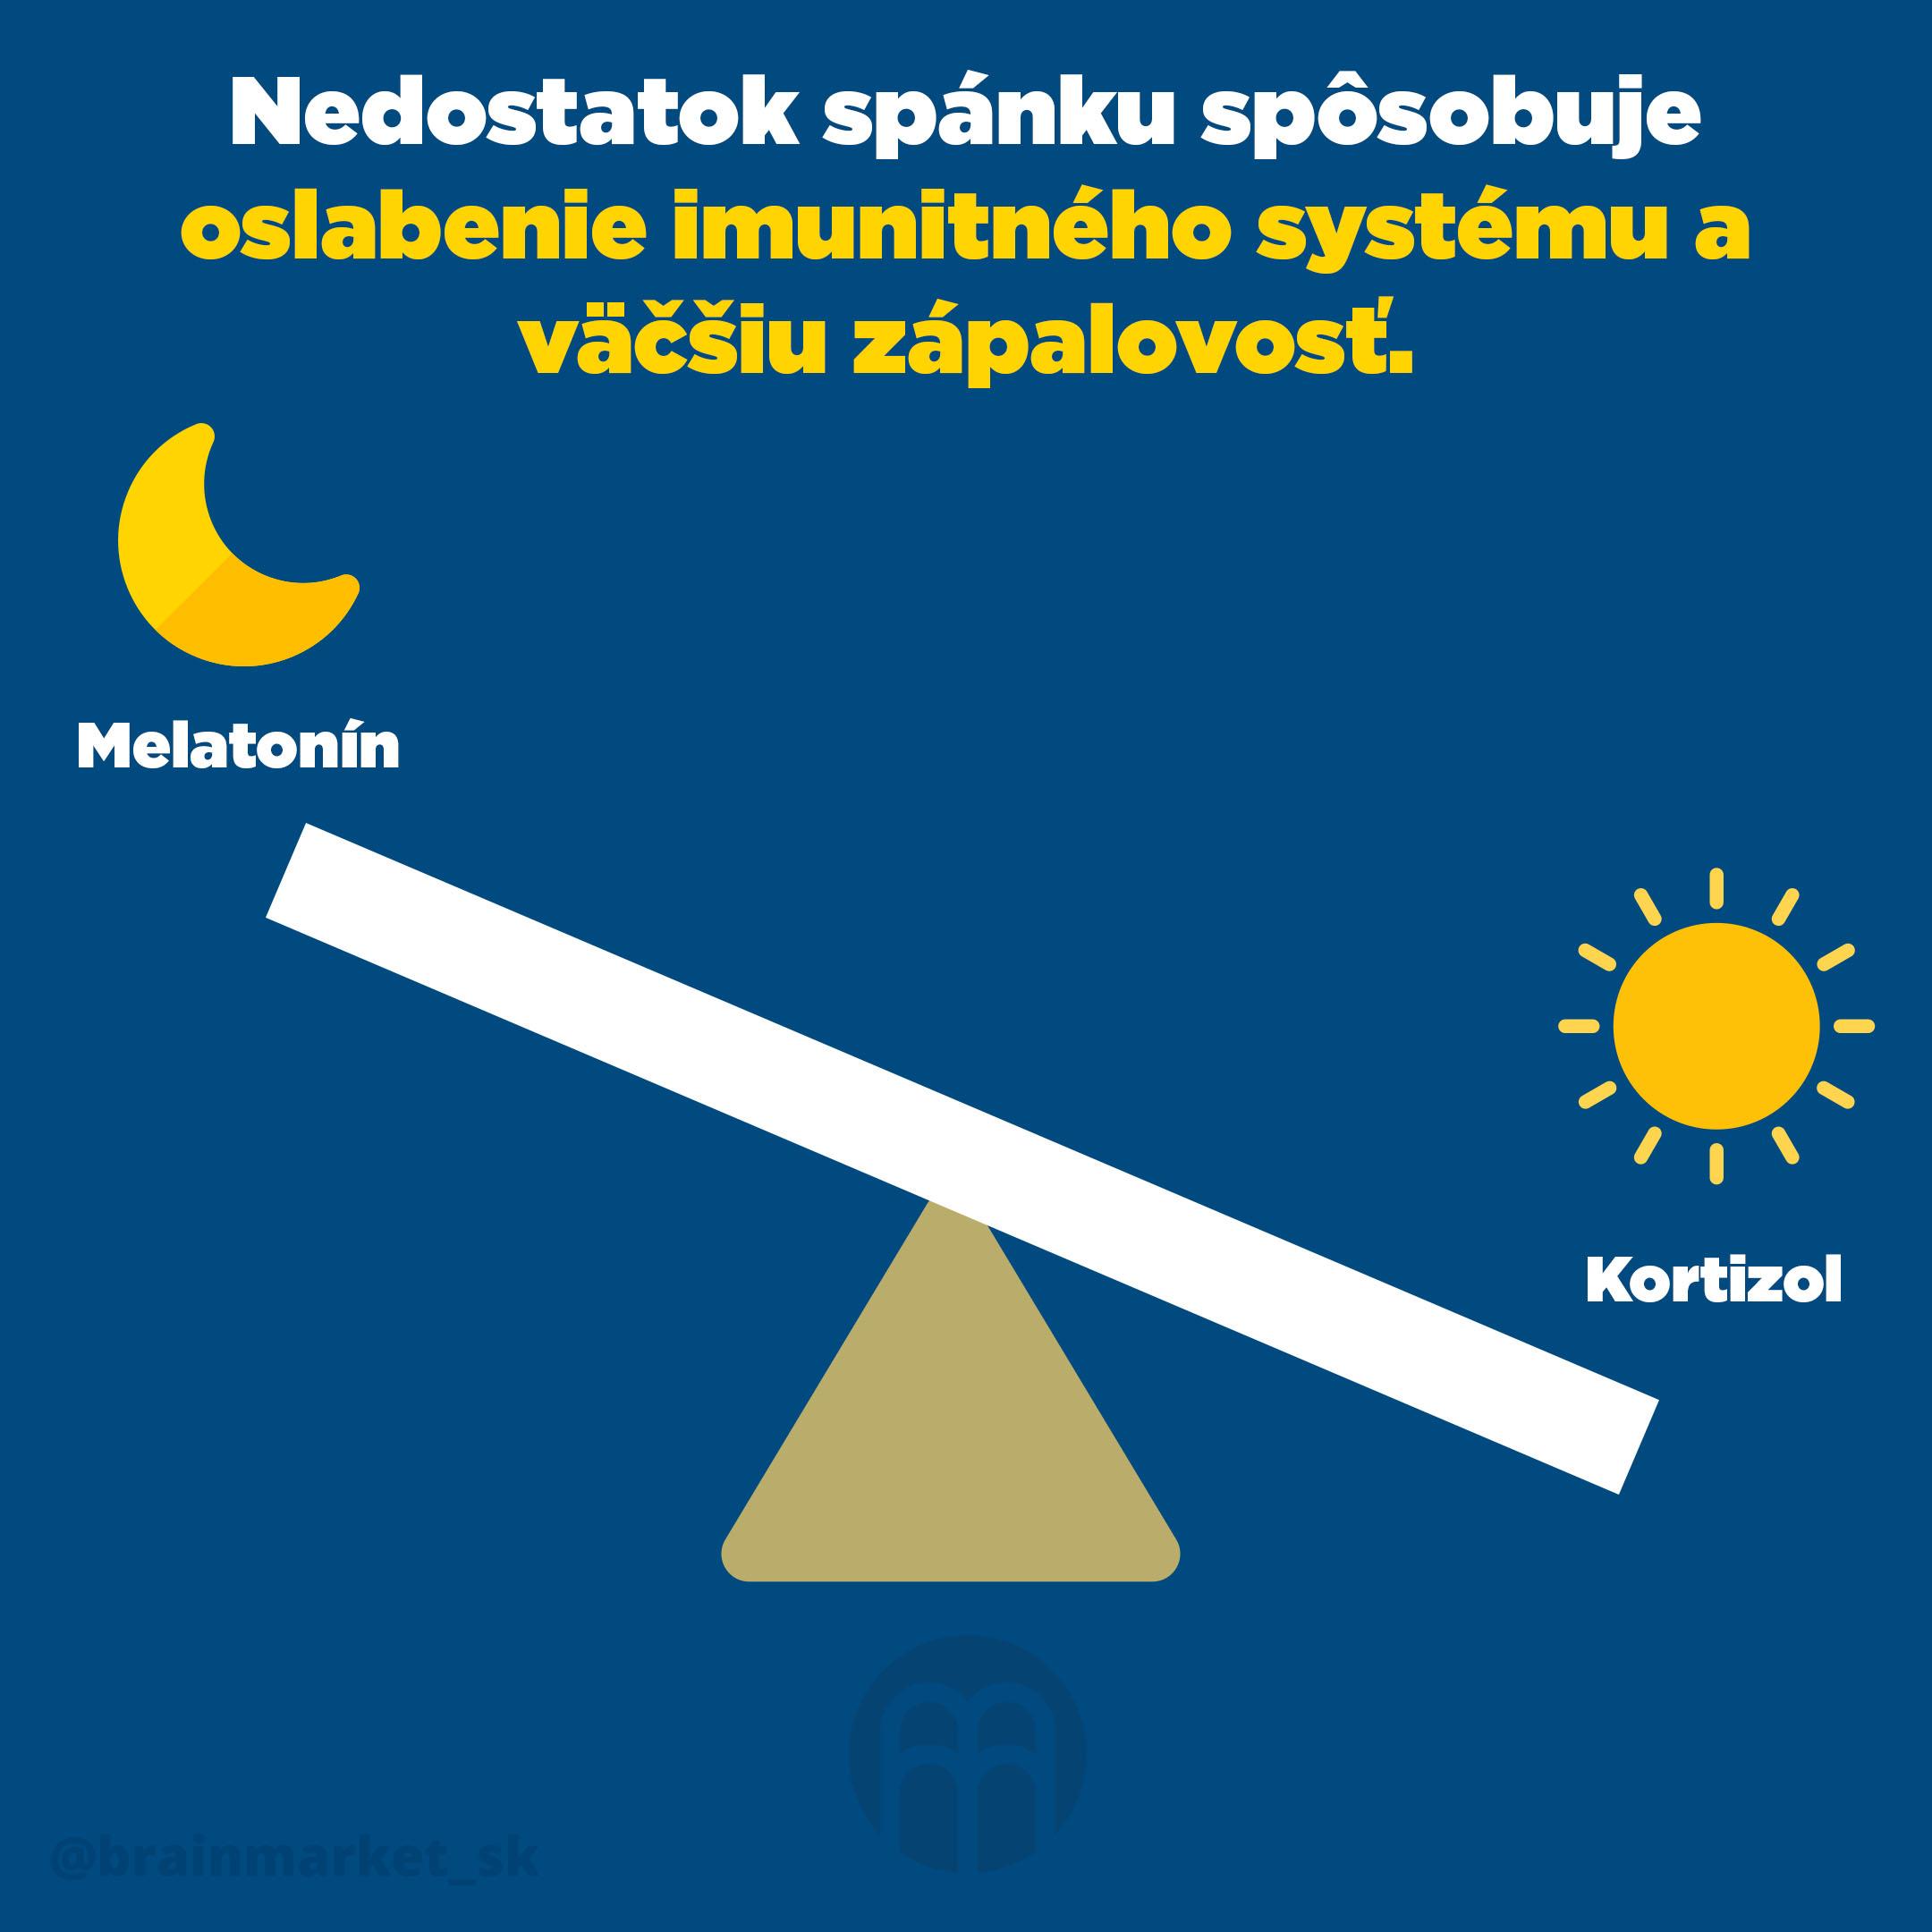 melatonin_kortizol_SK_Infografika_Instagram_BrainMarket